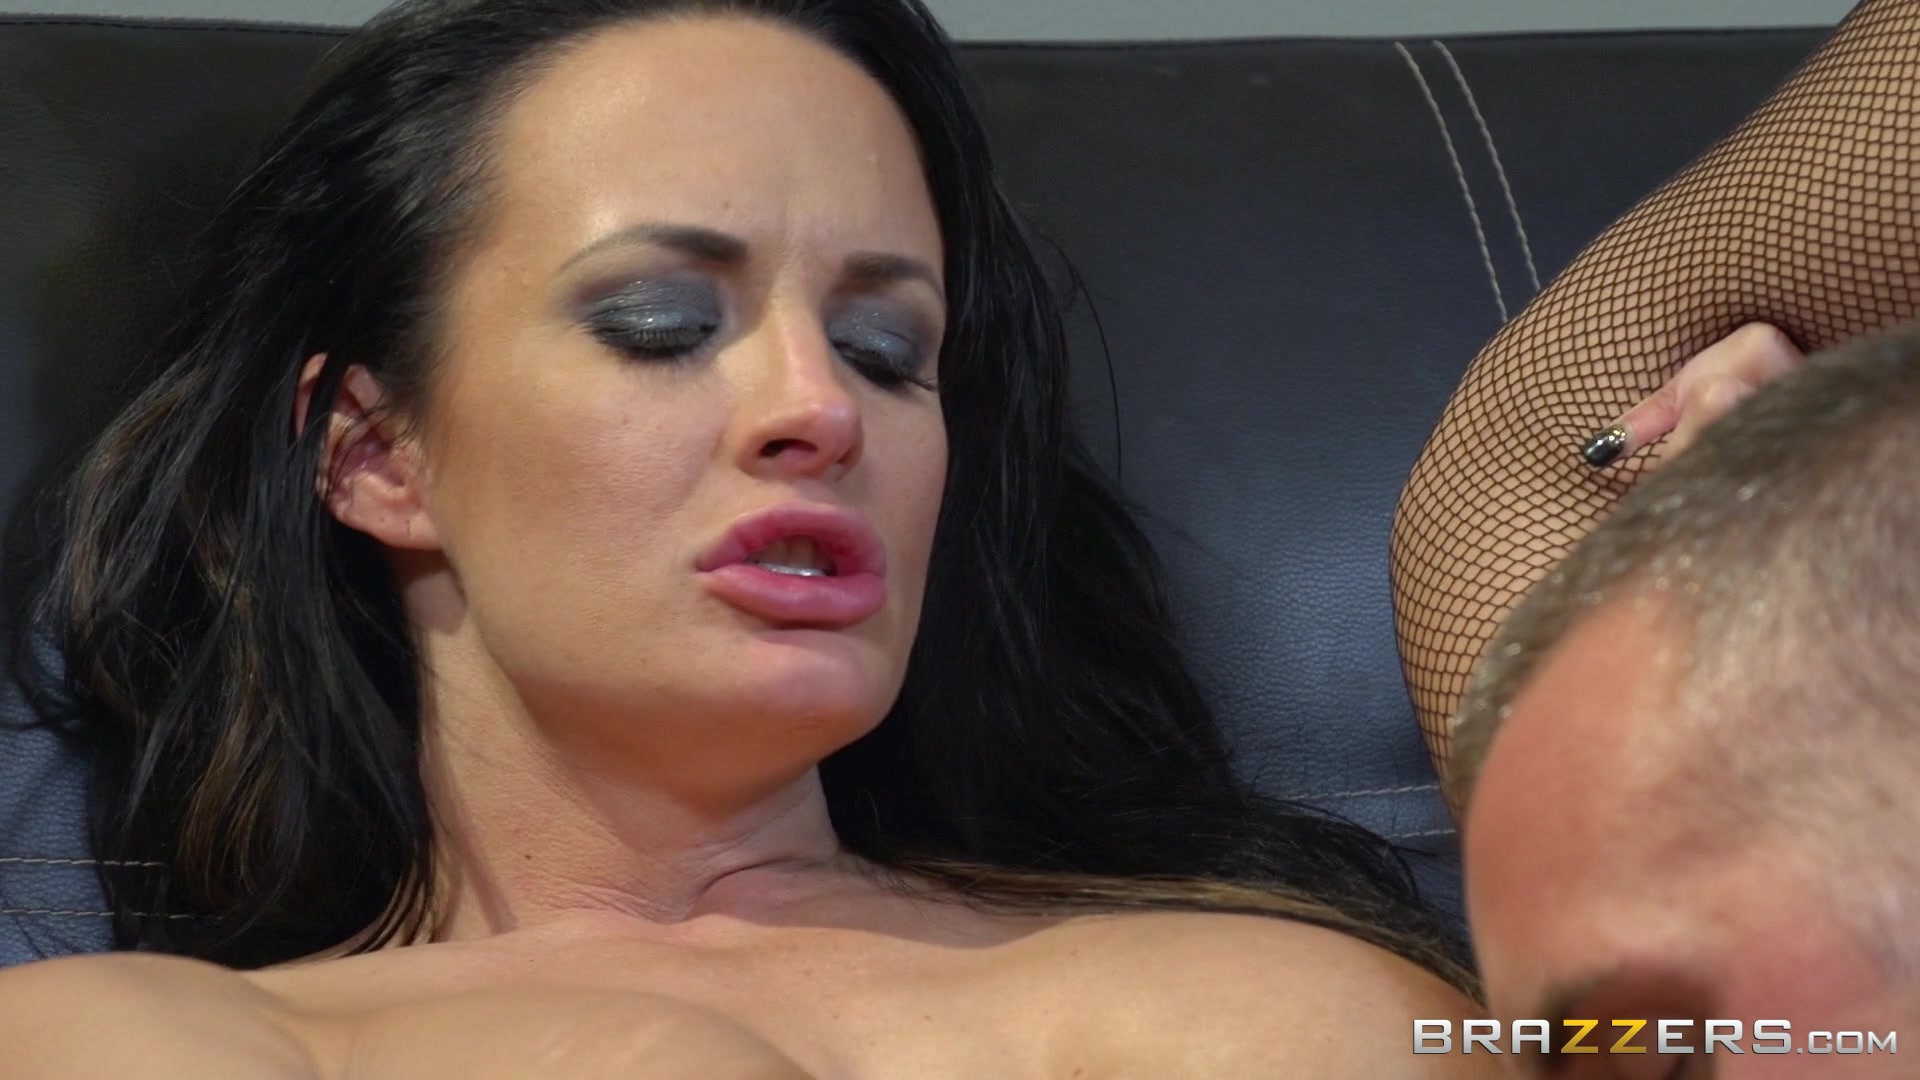 Dark Haired Busty Babe Alektra Blue Takes an Ass Pounding Starring:  Alektra Blue